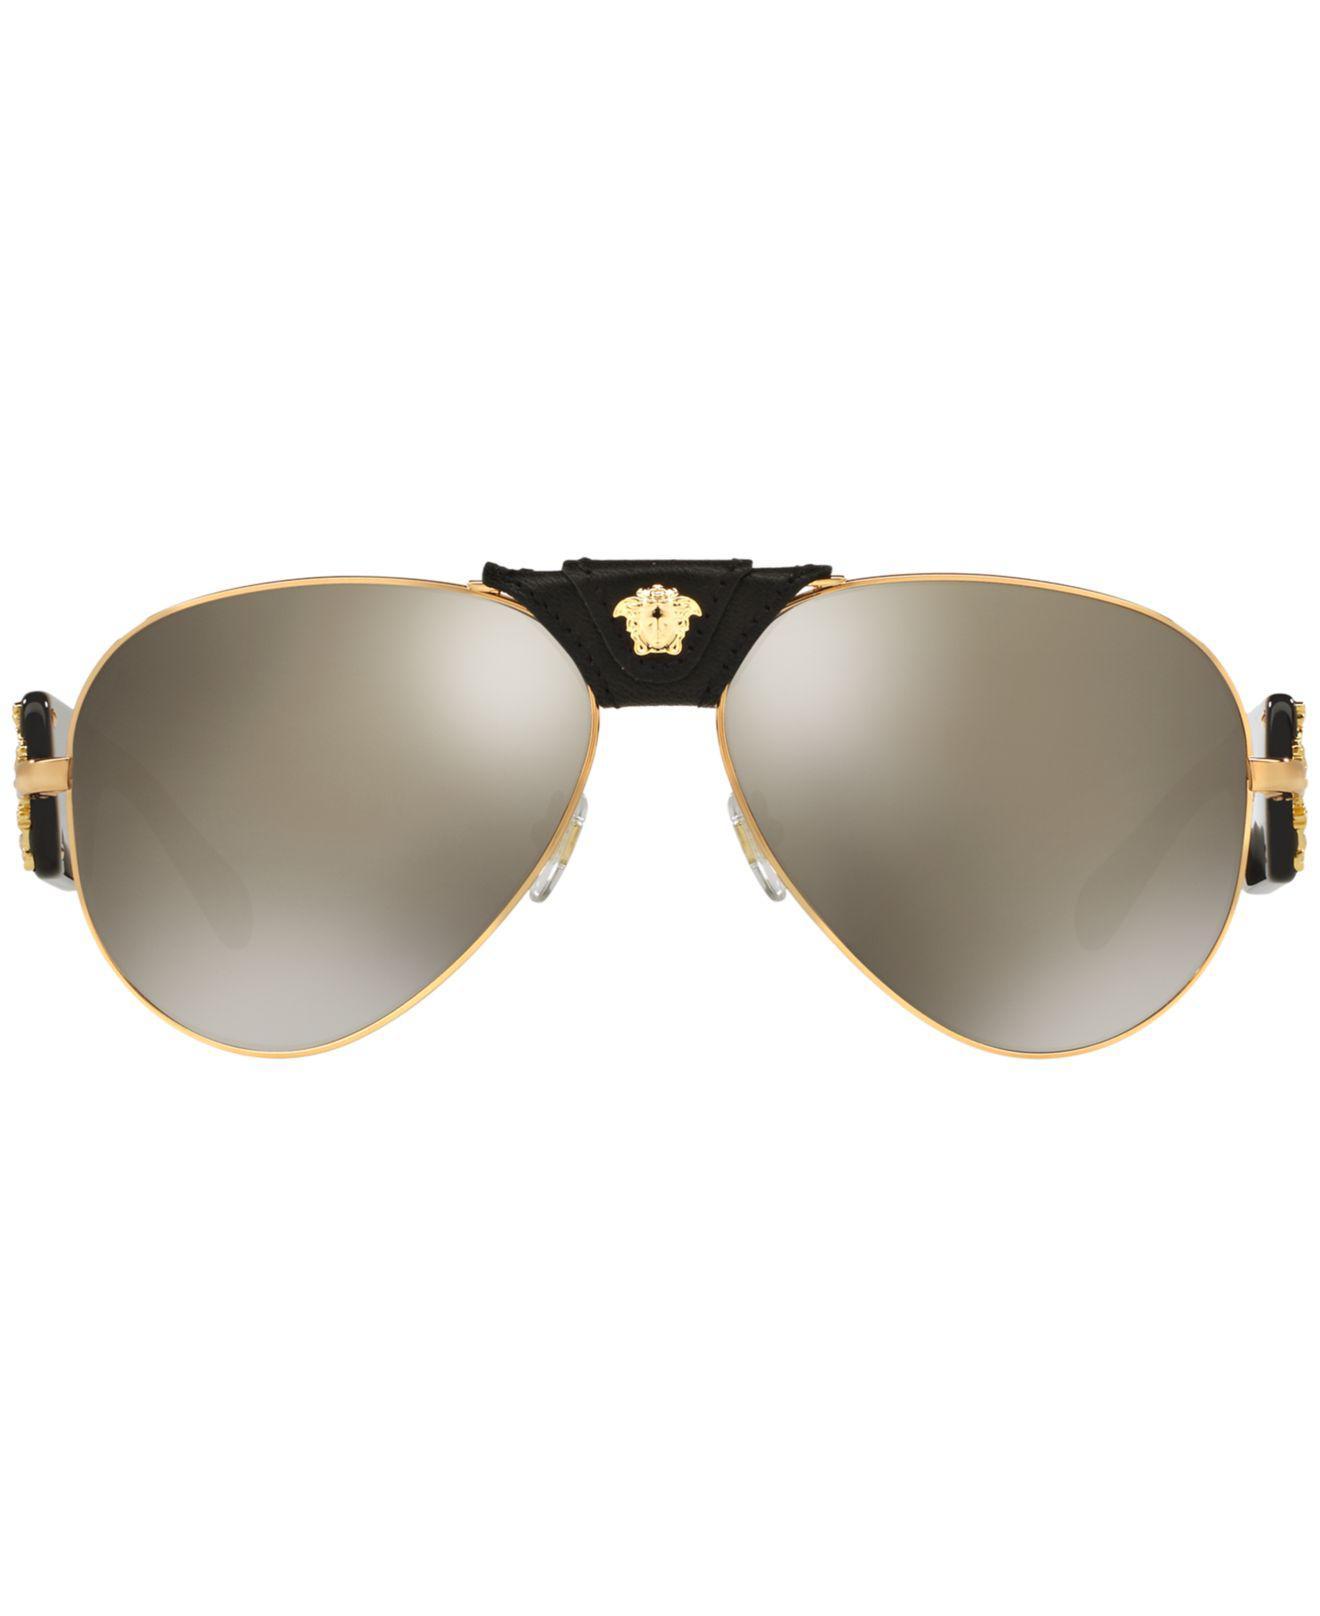 Lyst - Versace Sunglasses, Ve2150q in Brown